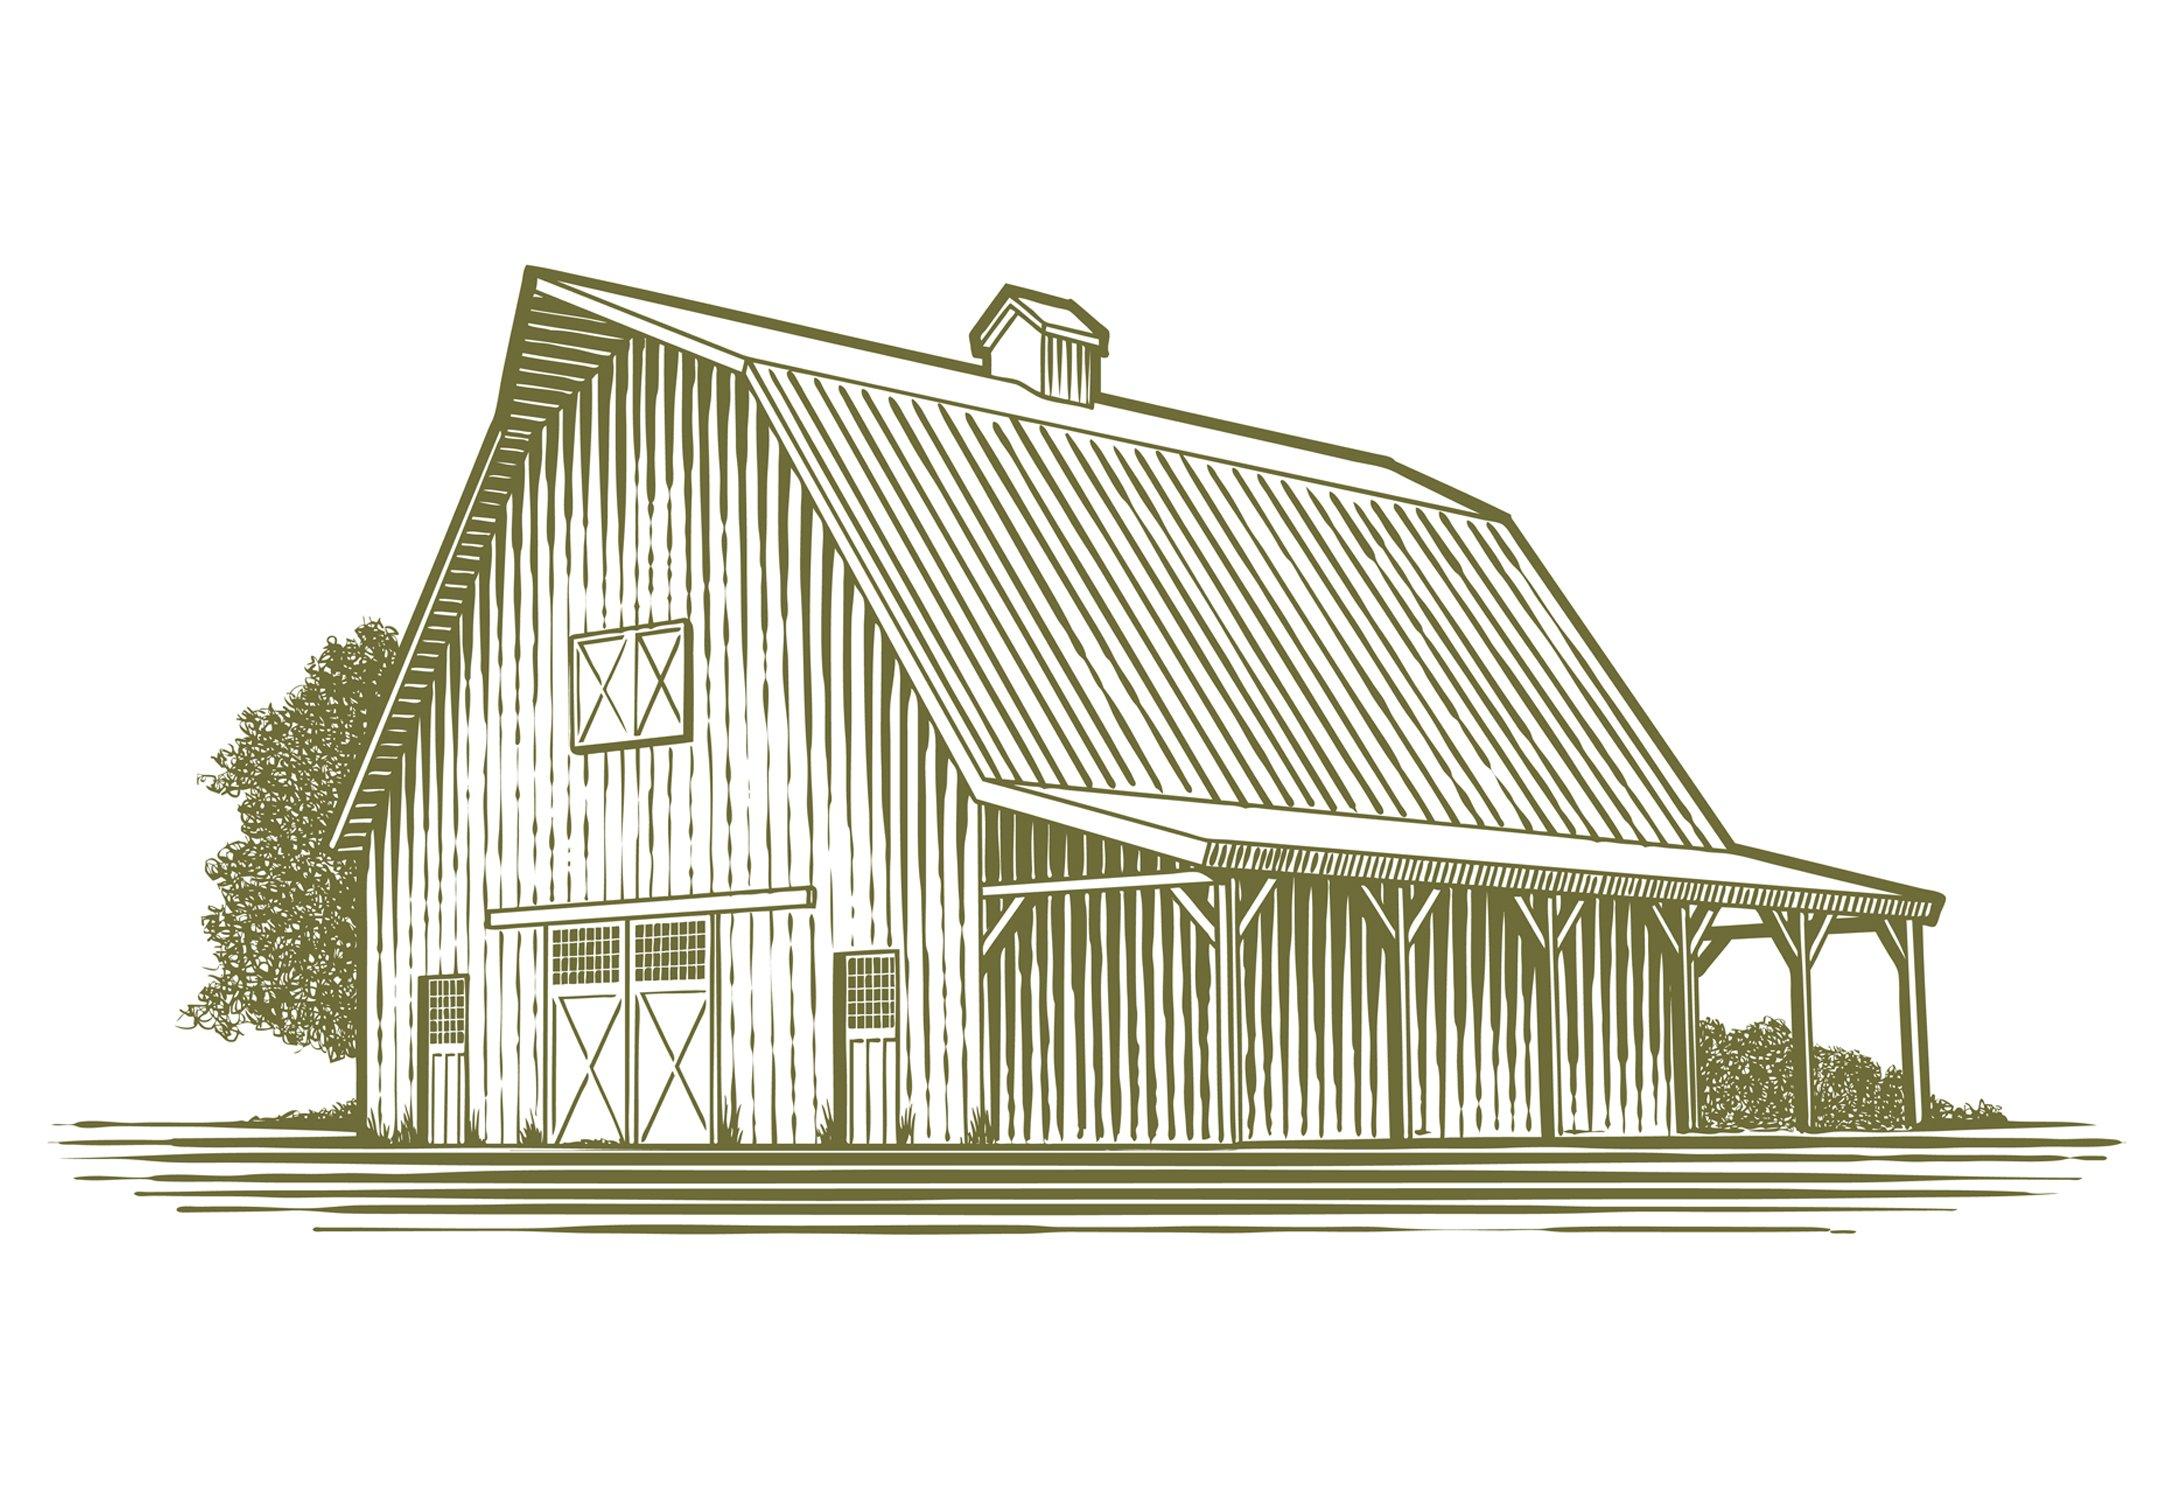 Health Food Barn